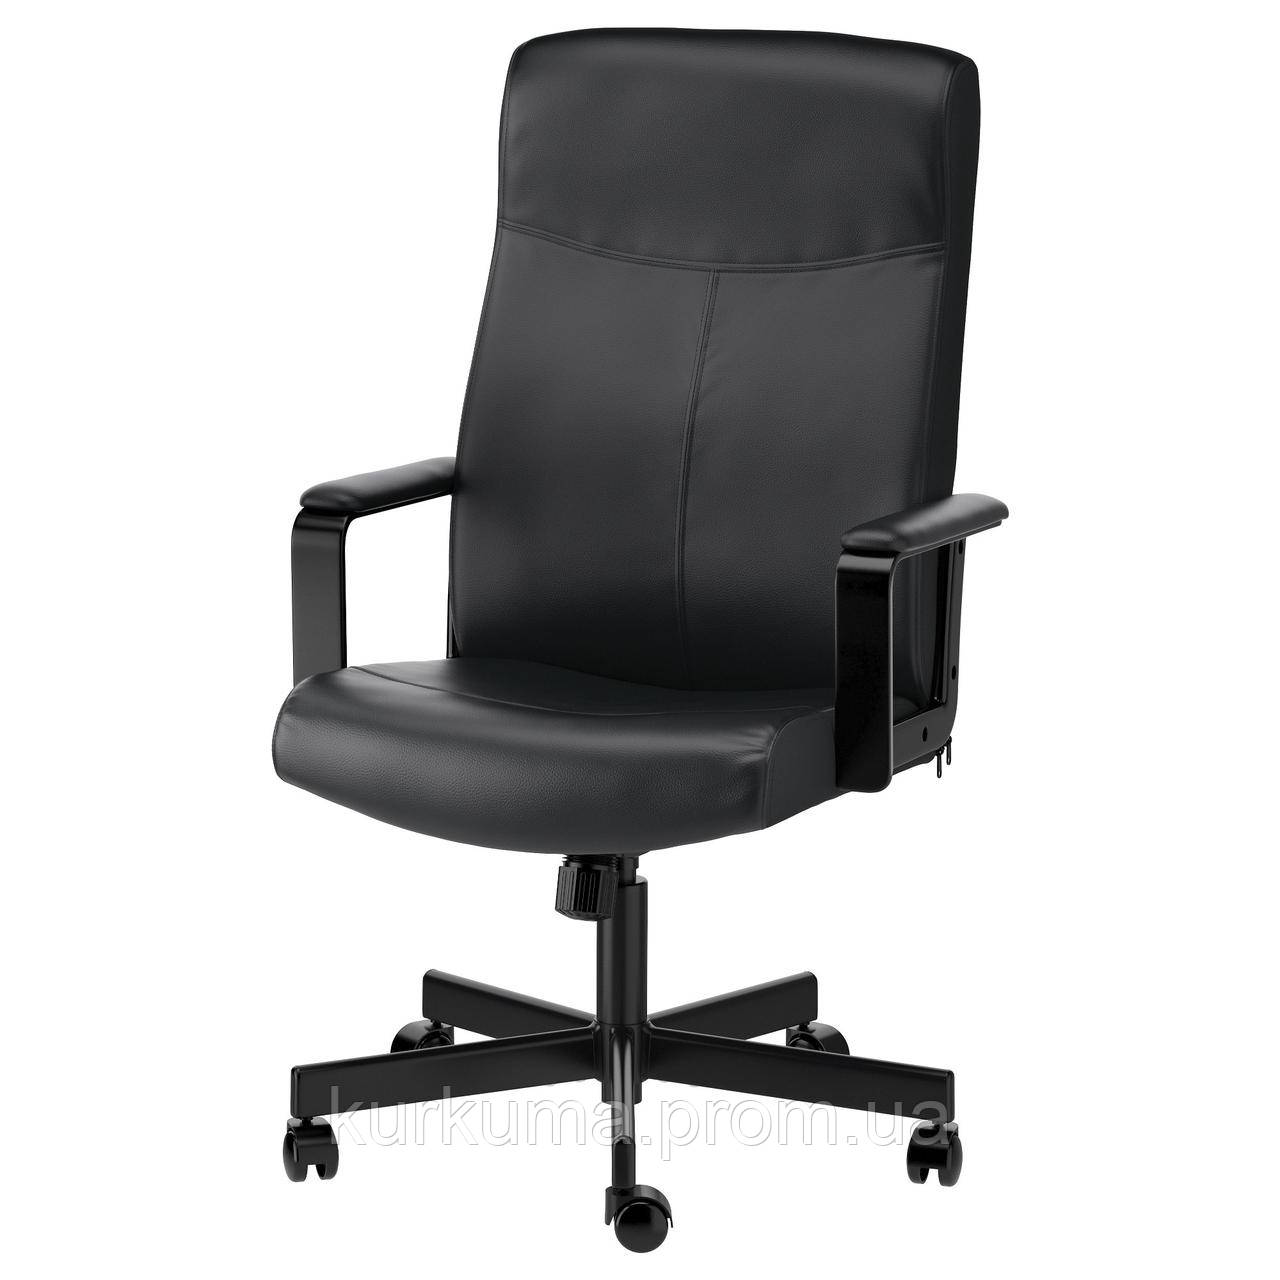 IKEA MILLBERGET Рабочий стул, Бомстад черный  (903.394.12)